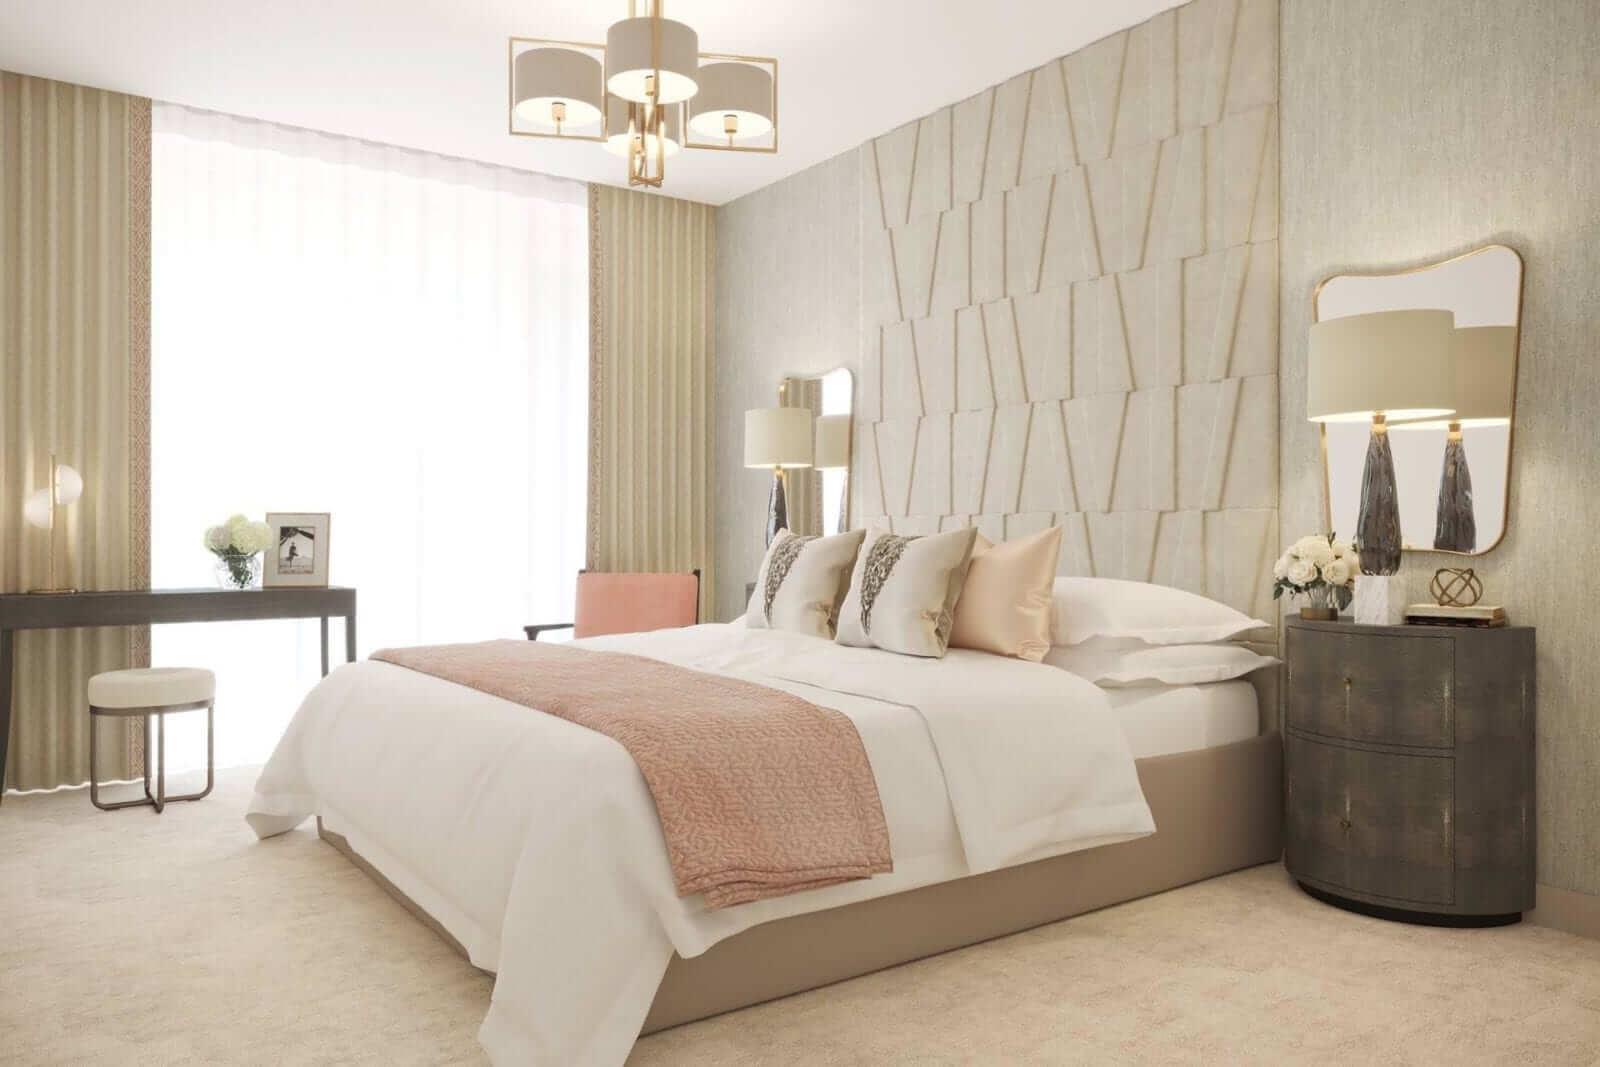 Bedroom design by Sara Cosgrove Interior Design in Duplex Townhouses at Lansdowne Place